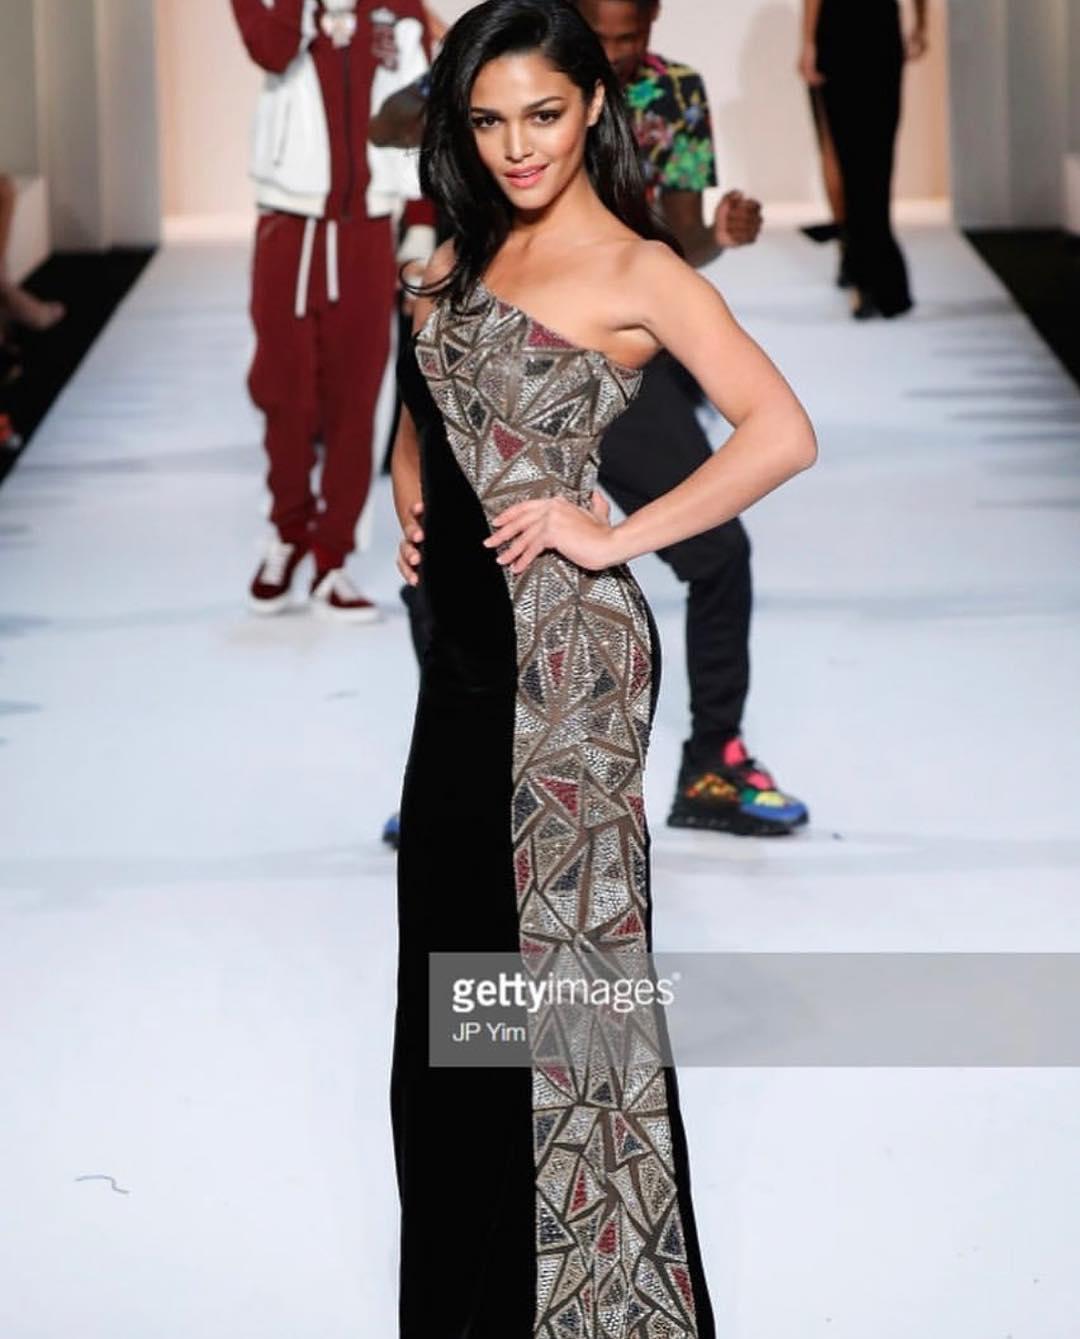 kiara liz ortega, top 5 de miss universe 2018. - Página 42 50294710